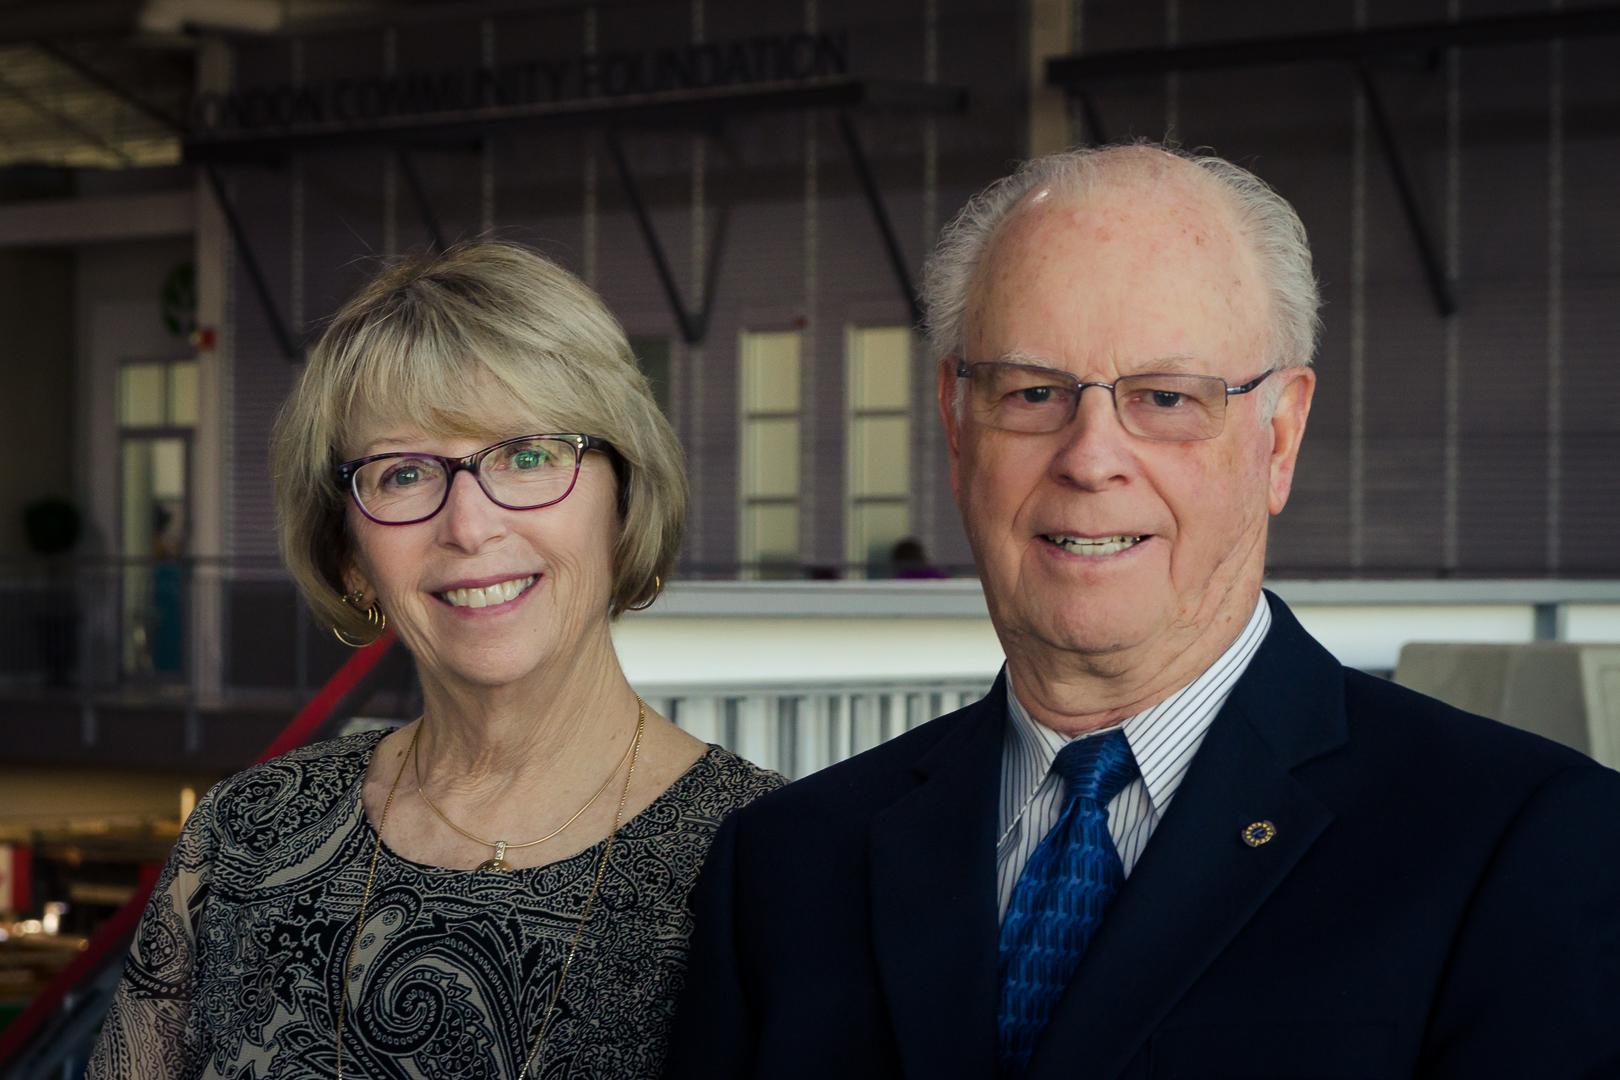 Catherine and Gordon Sellery